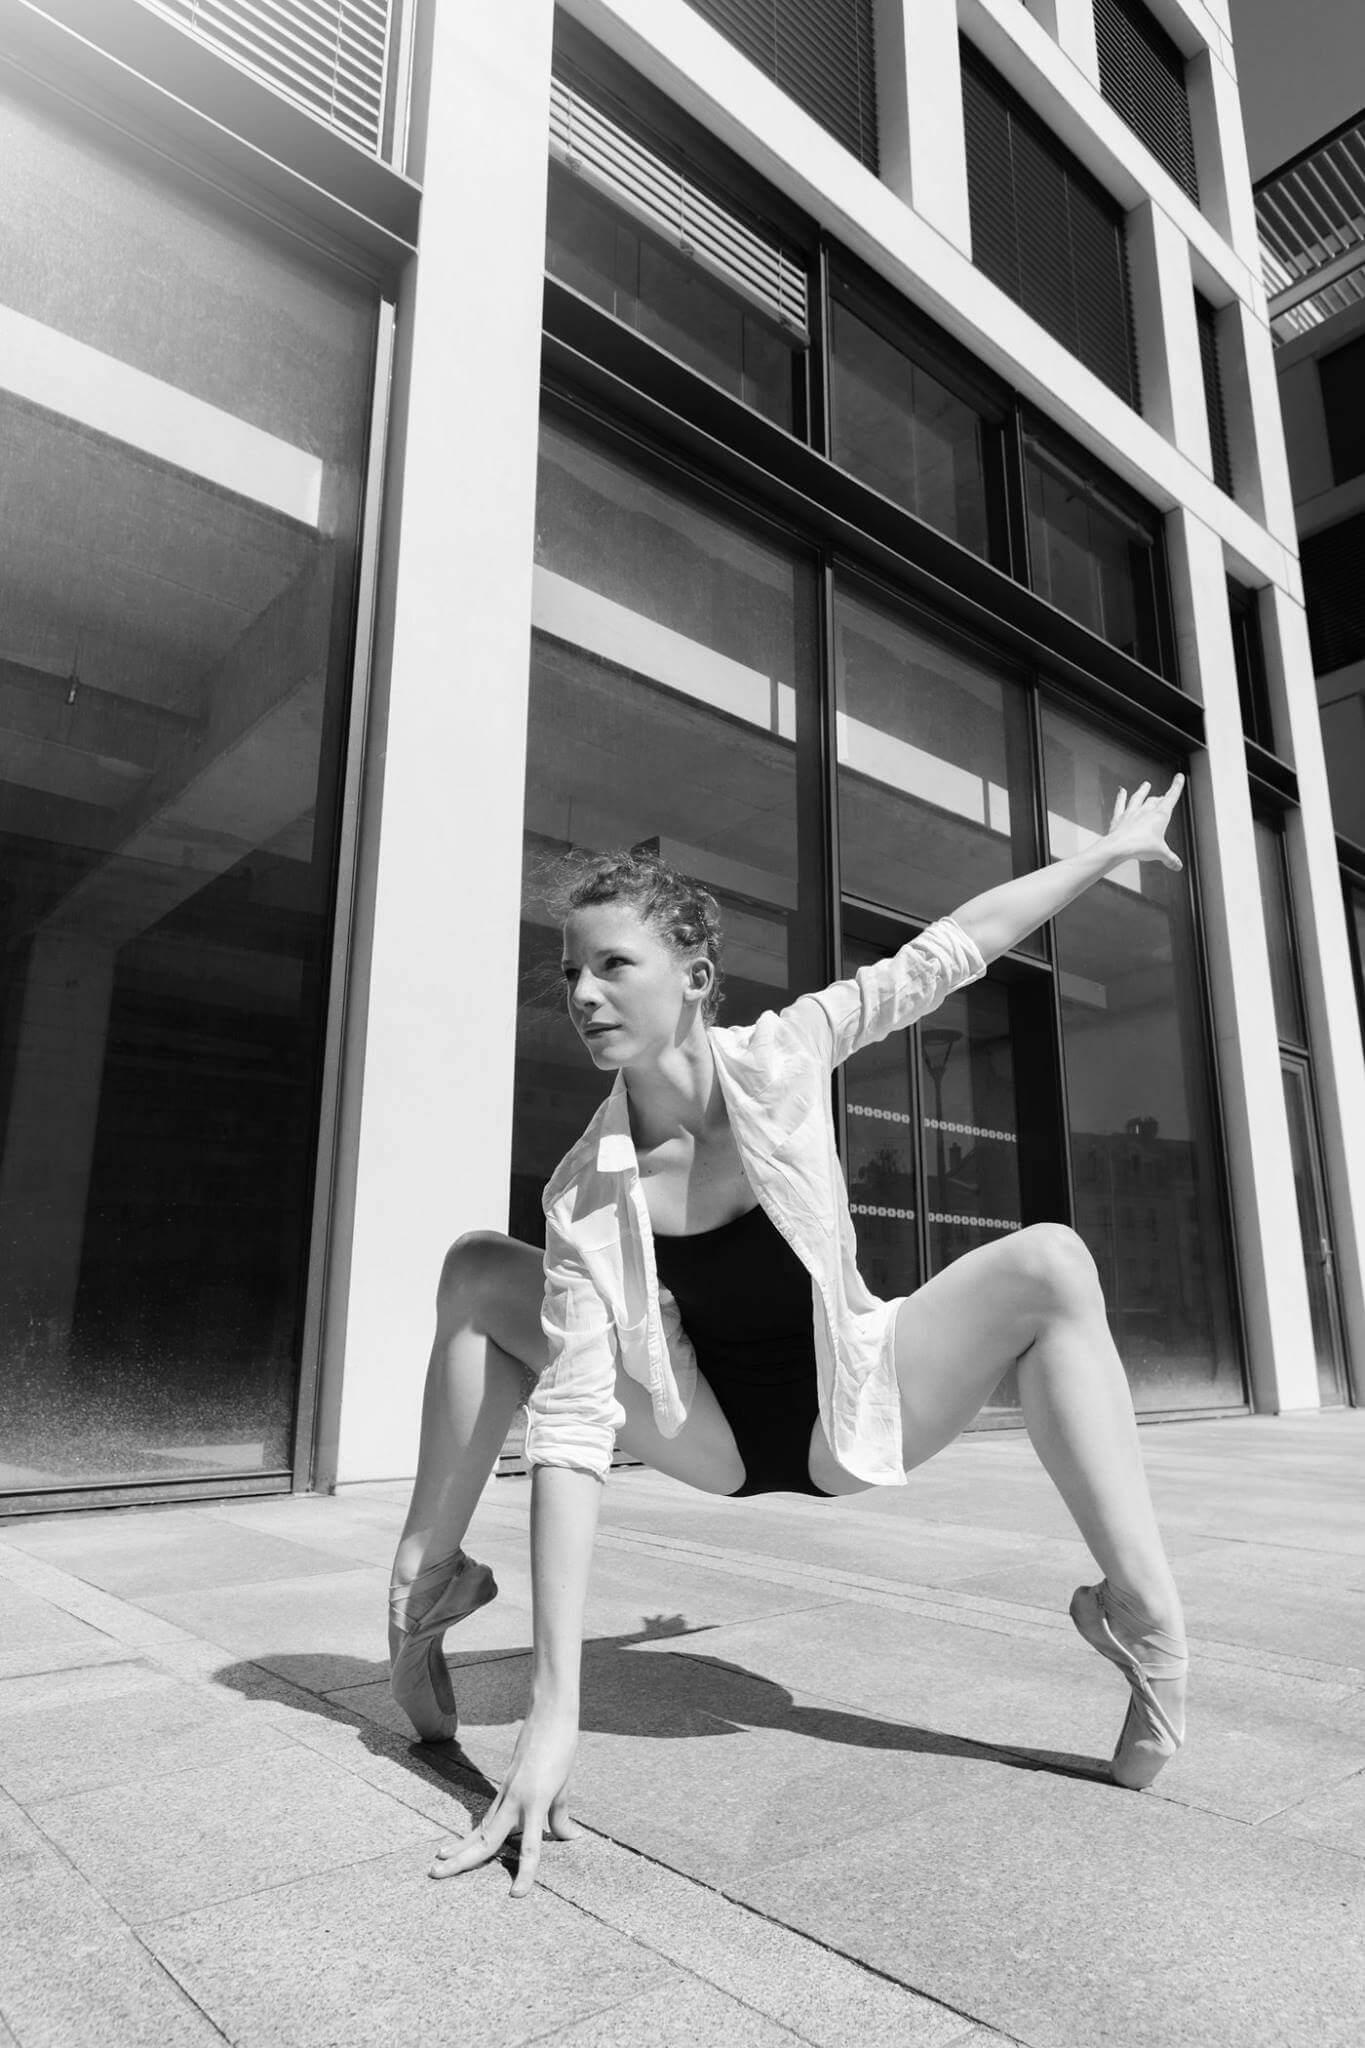 Danse sur pointes moderne futuriste